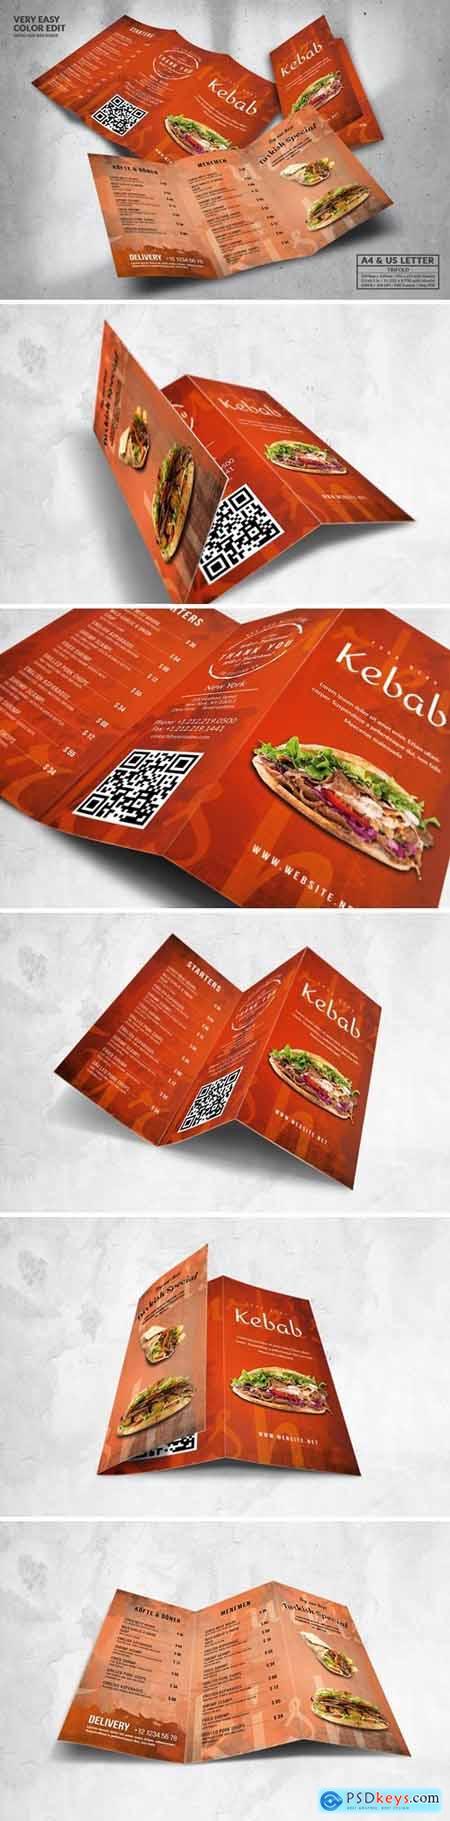 Trifold Food Menu Design A4 & US Letter U8VB5WY